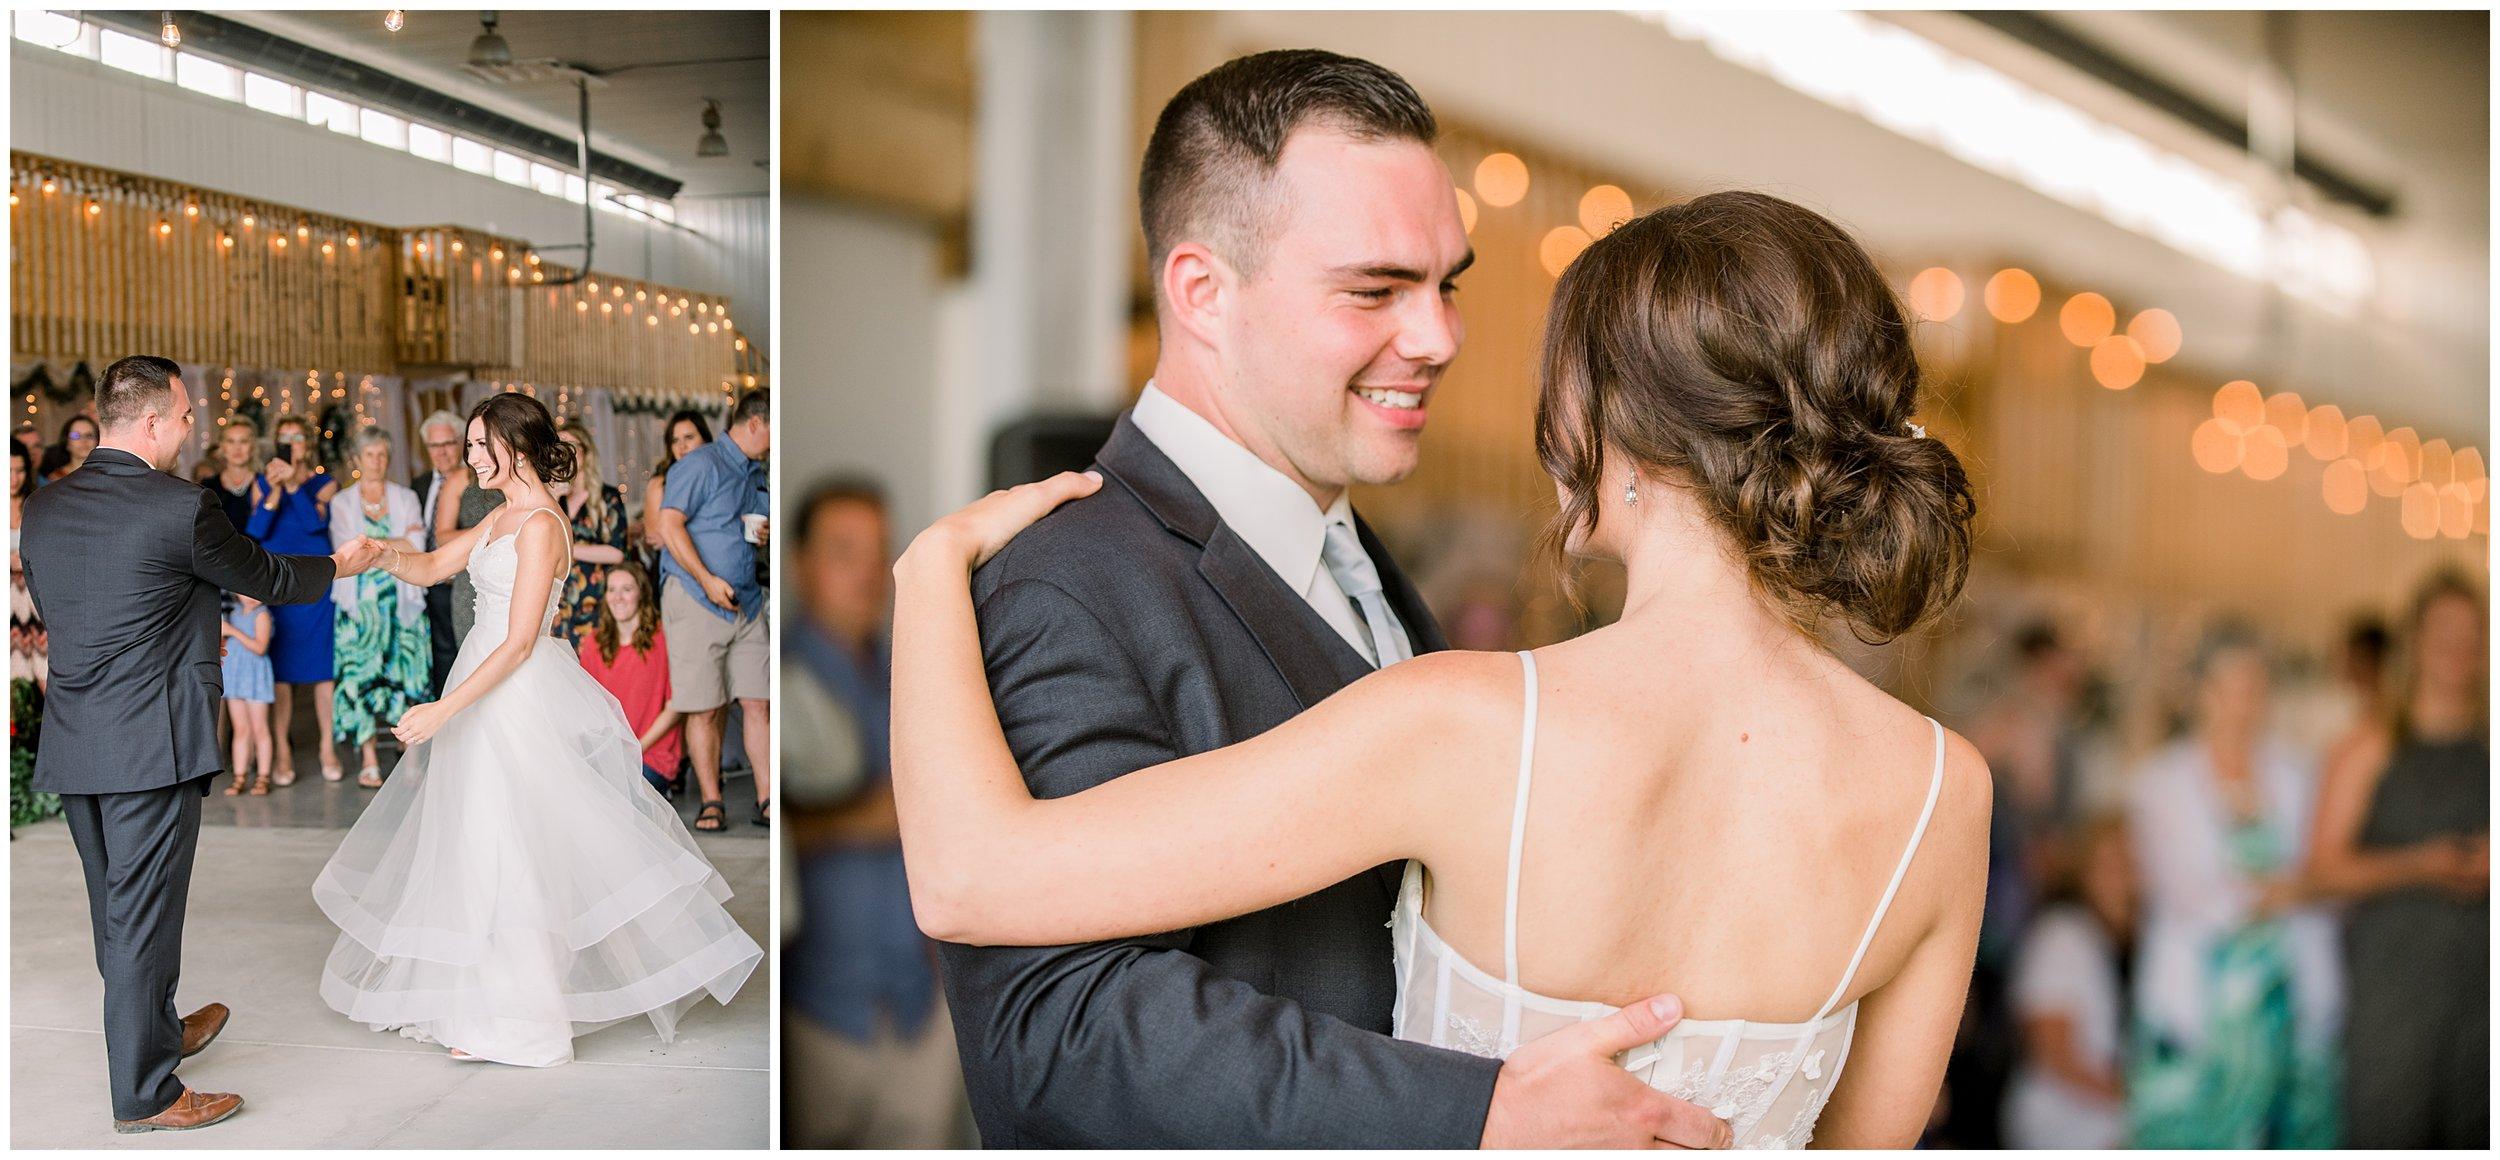 Alyssa-Poland-Photography_0629_alberta wedding.jpg